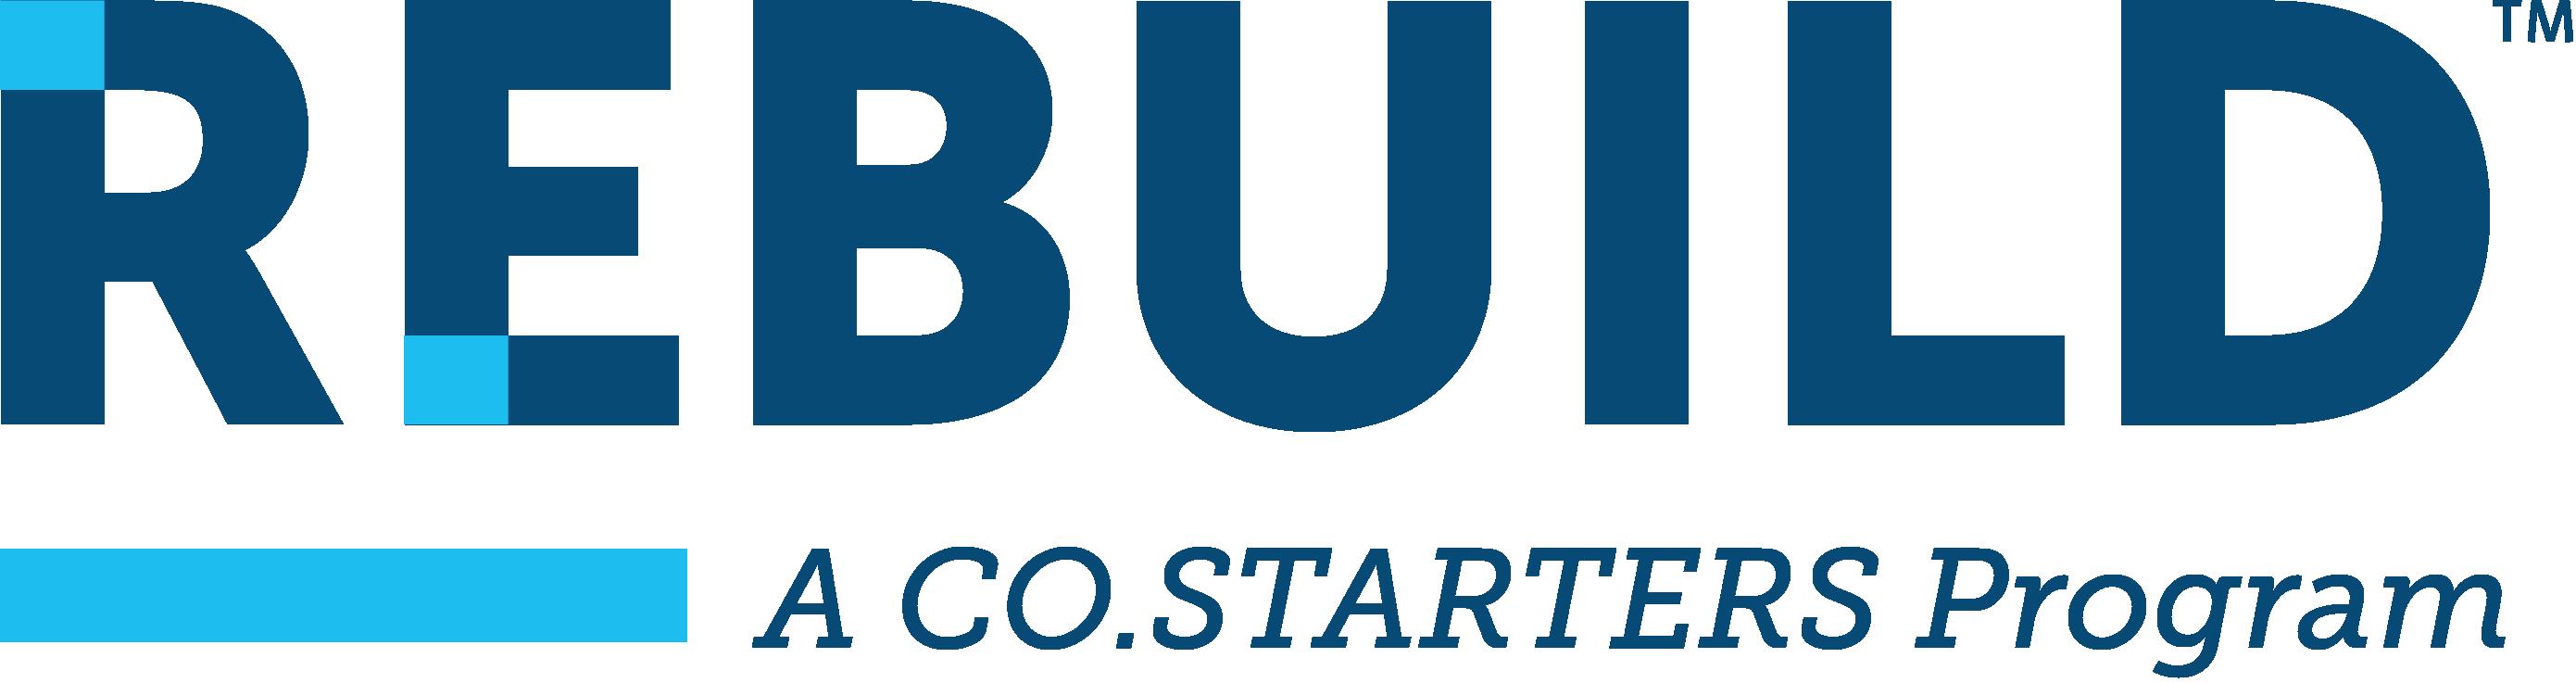 REBUILD: A CO.STARTERS Program